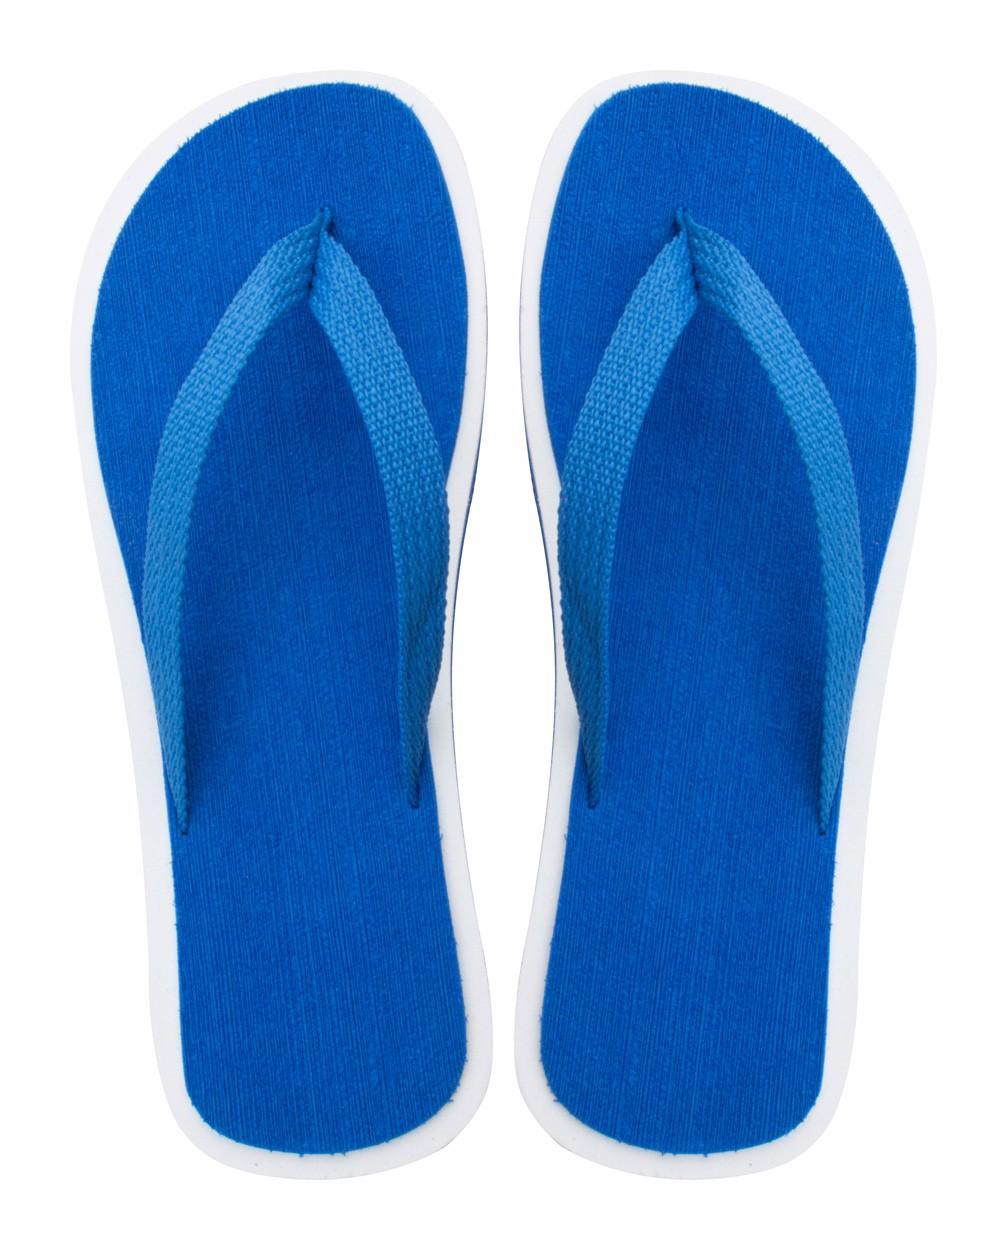 Plážové Žabky Cayman - Modrá / Bílá / F